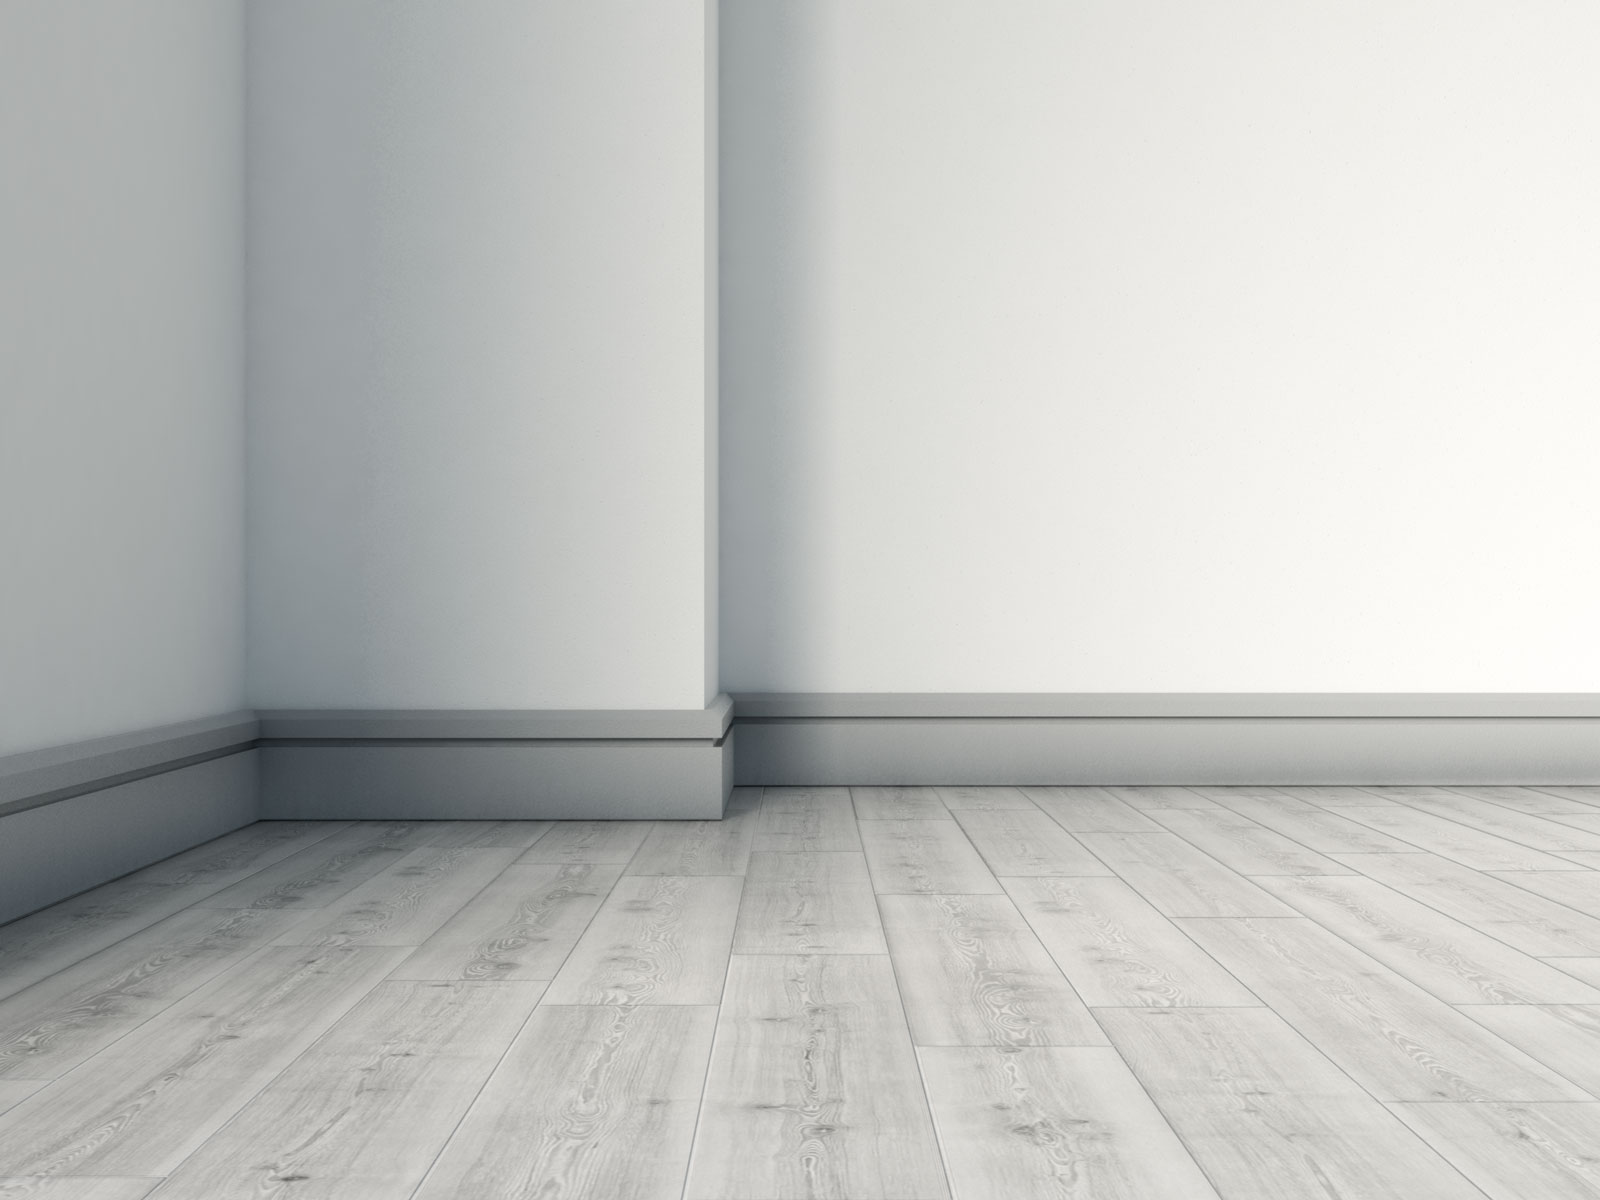 Gray baseboard with gray flooring